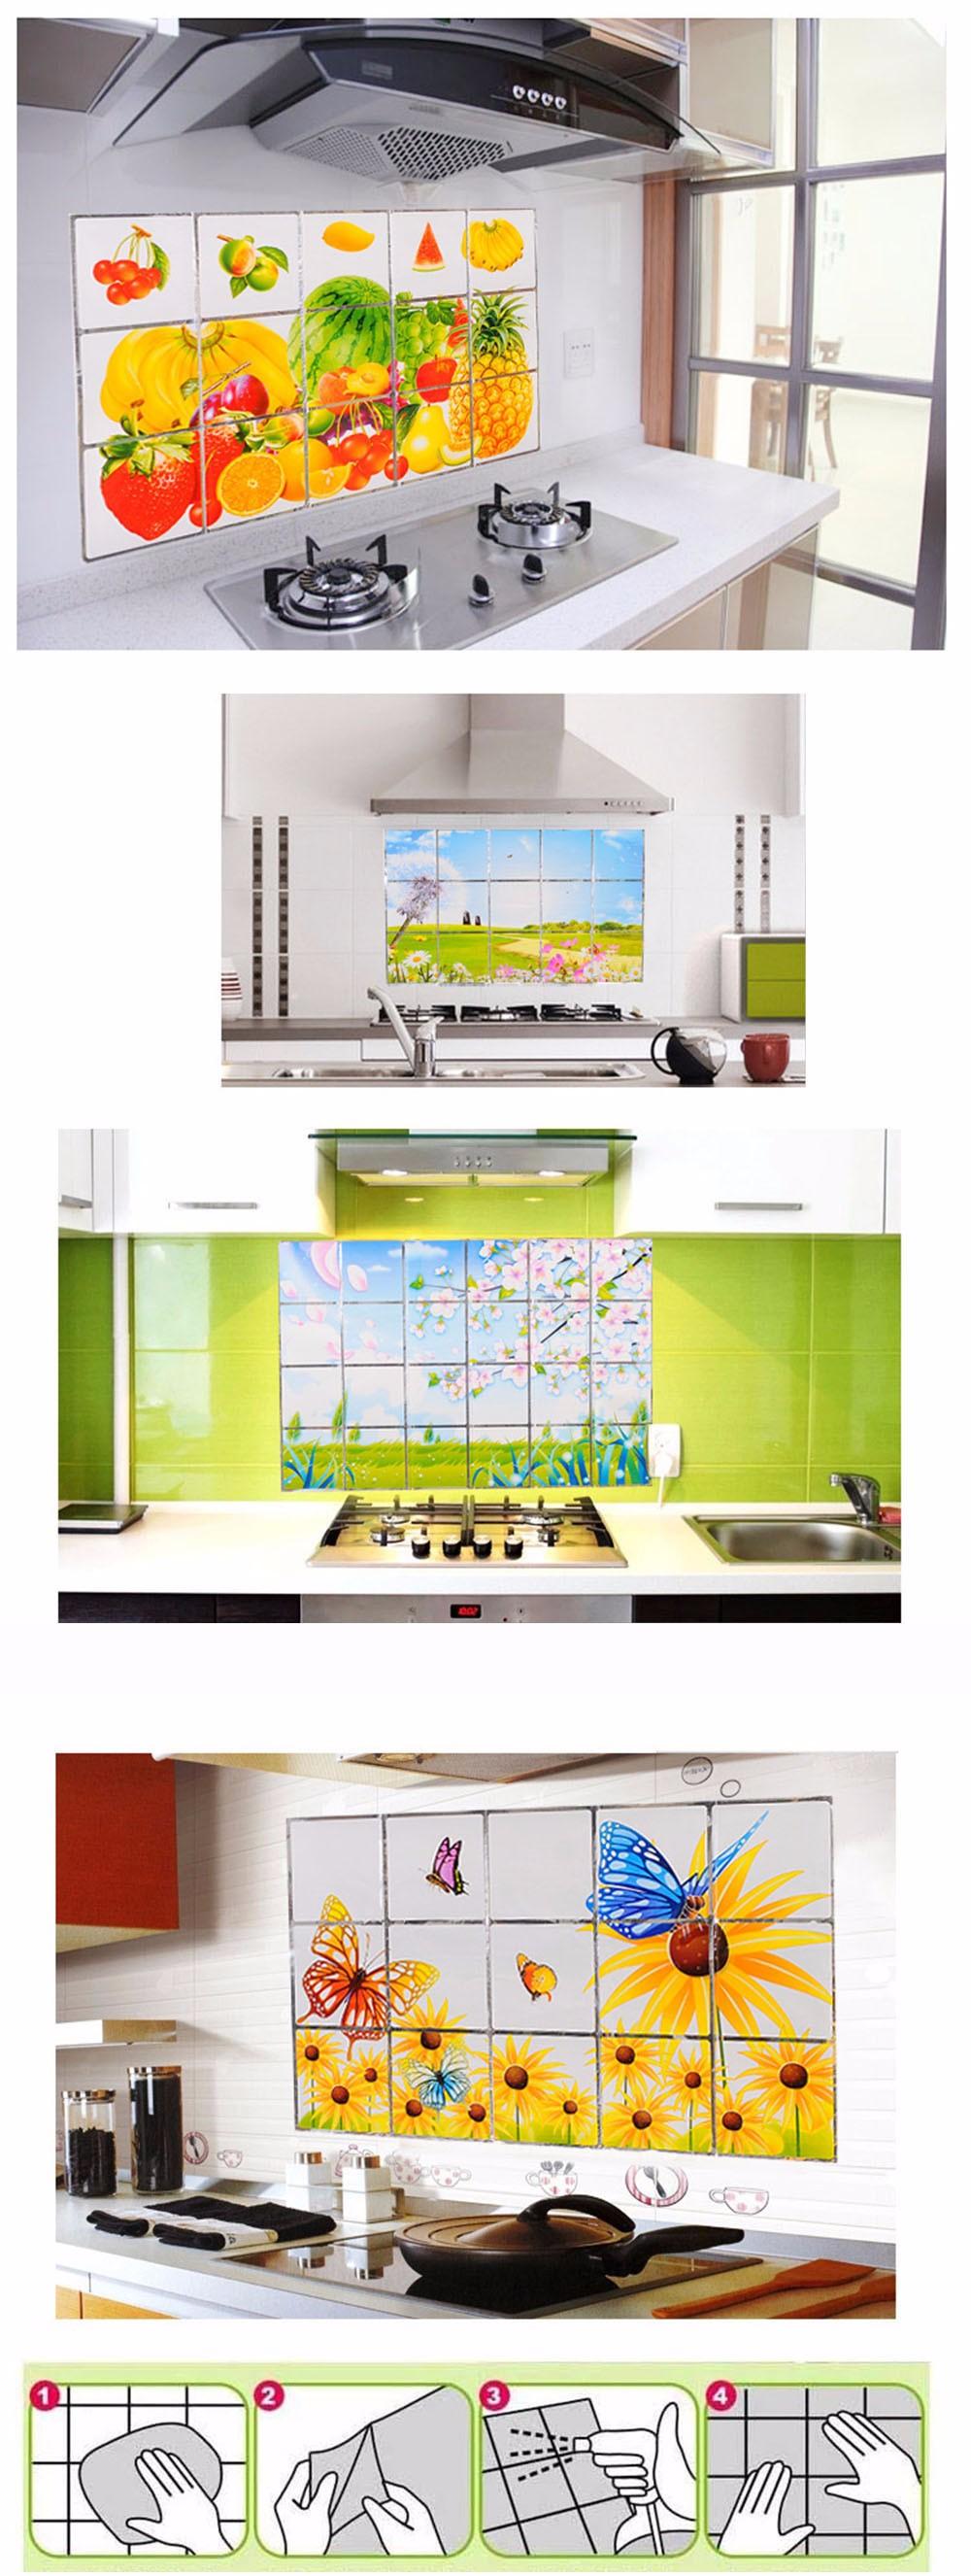 Wallpaper-Kitchen-Stickers-Waterproof-And-Oil-Proof-Stickers-Home-Decor-Kitchen-Wall-Decor-Tile-Flower-Pattern-HG0221 (10)